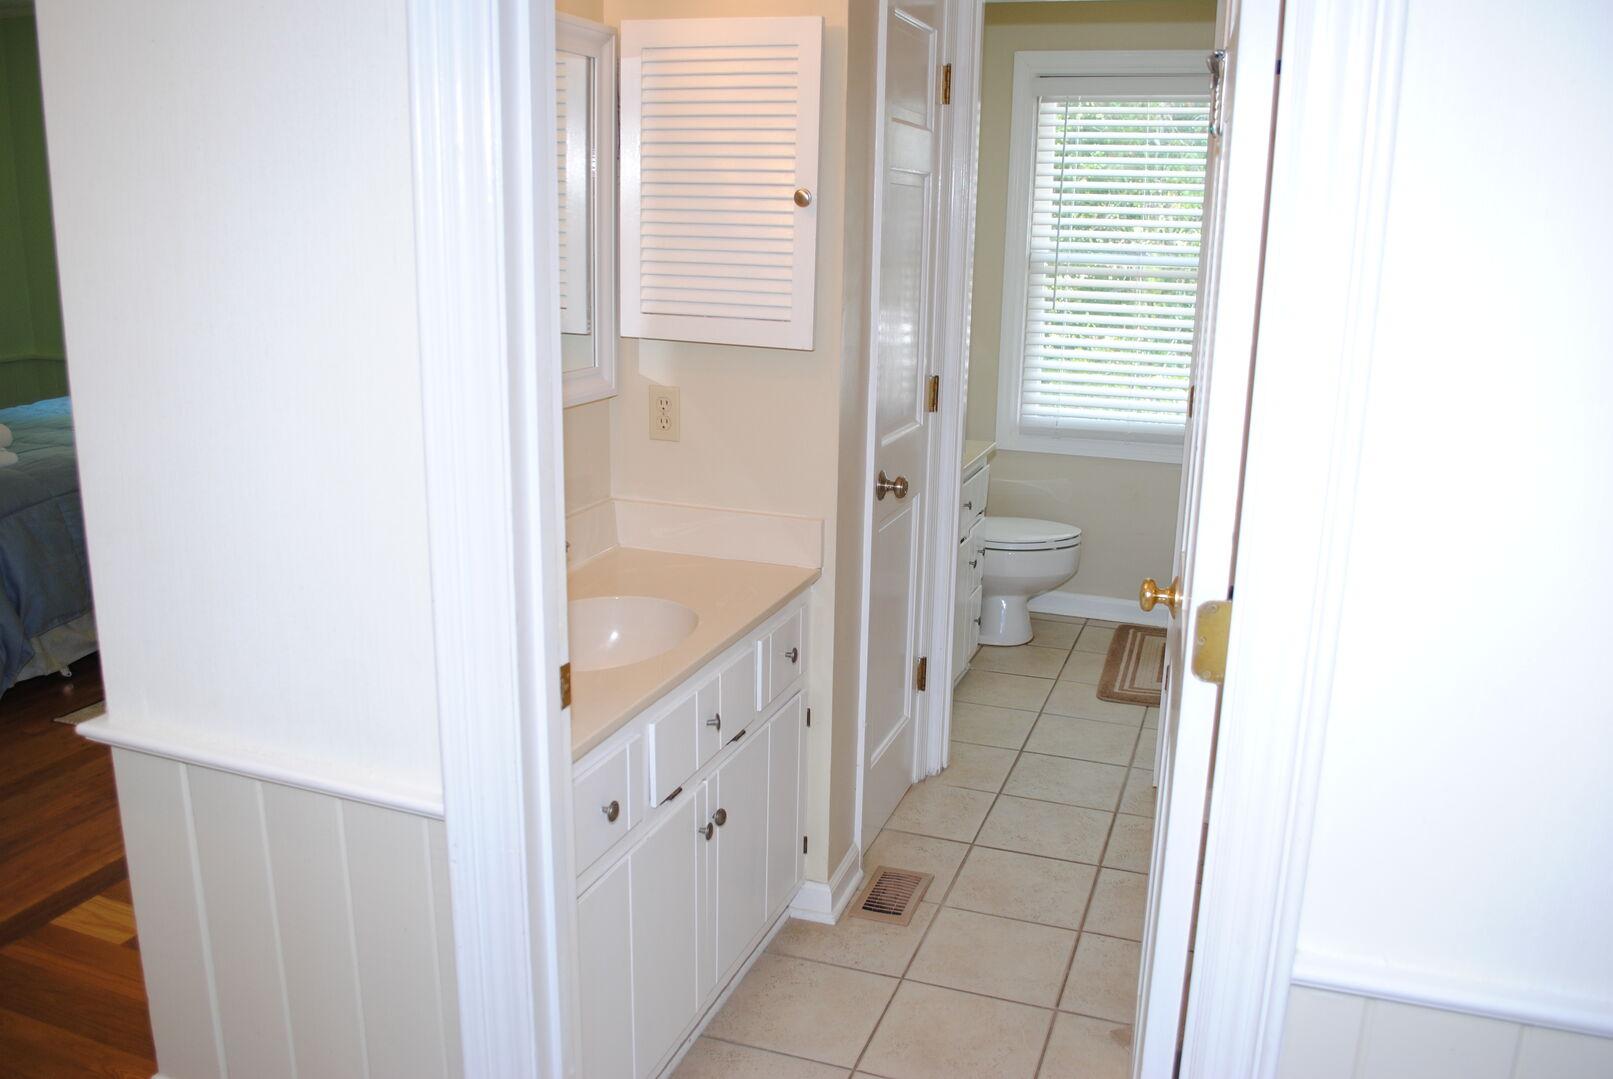 Hallway Bathroom and Laundry Area - First Floor